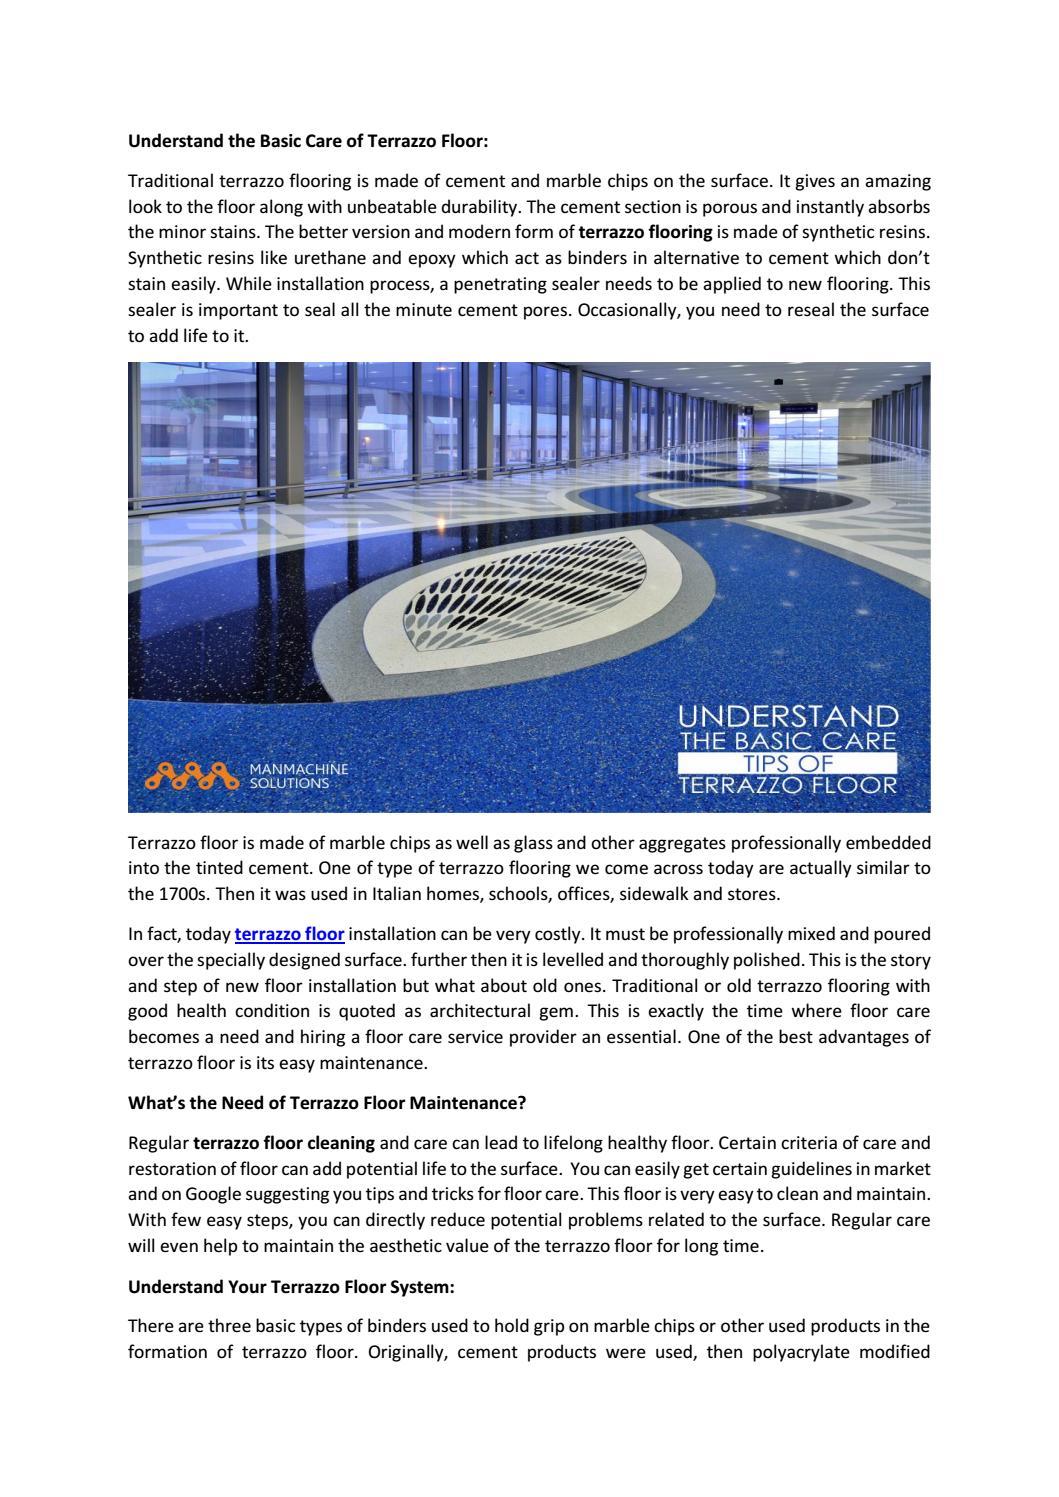 Understand The Basic Care Of Terrazzo Floor By Manmachine